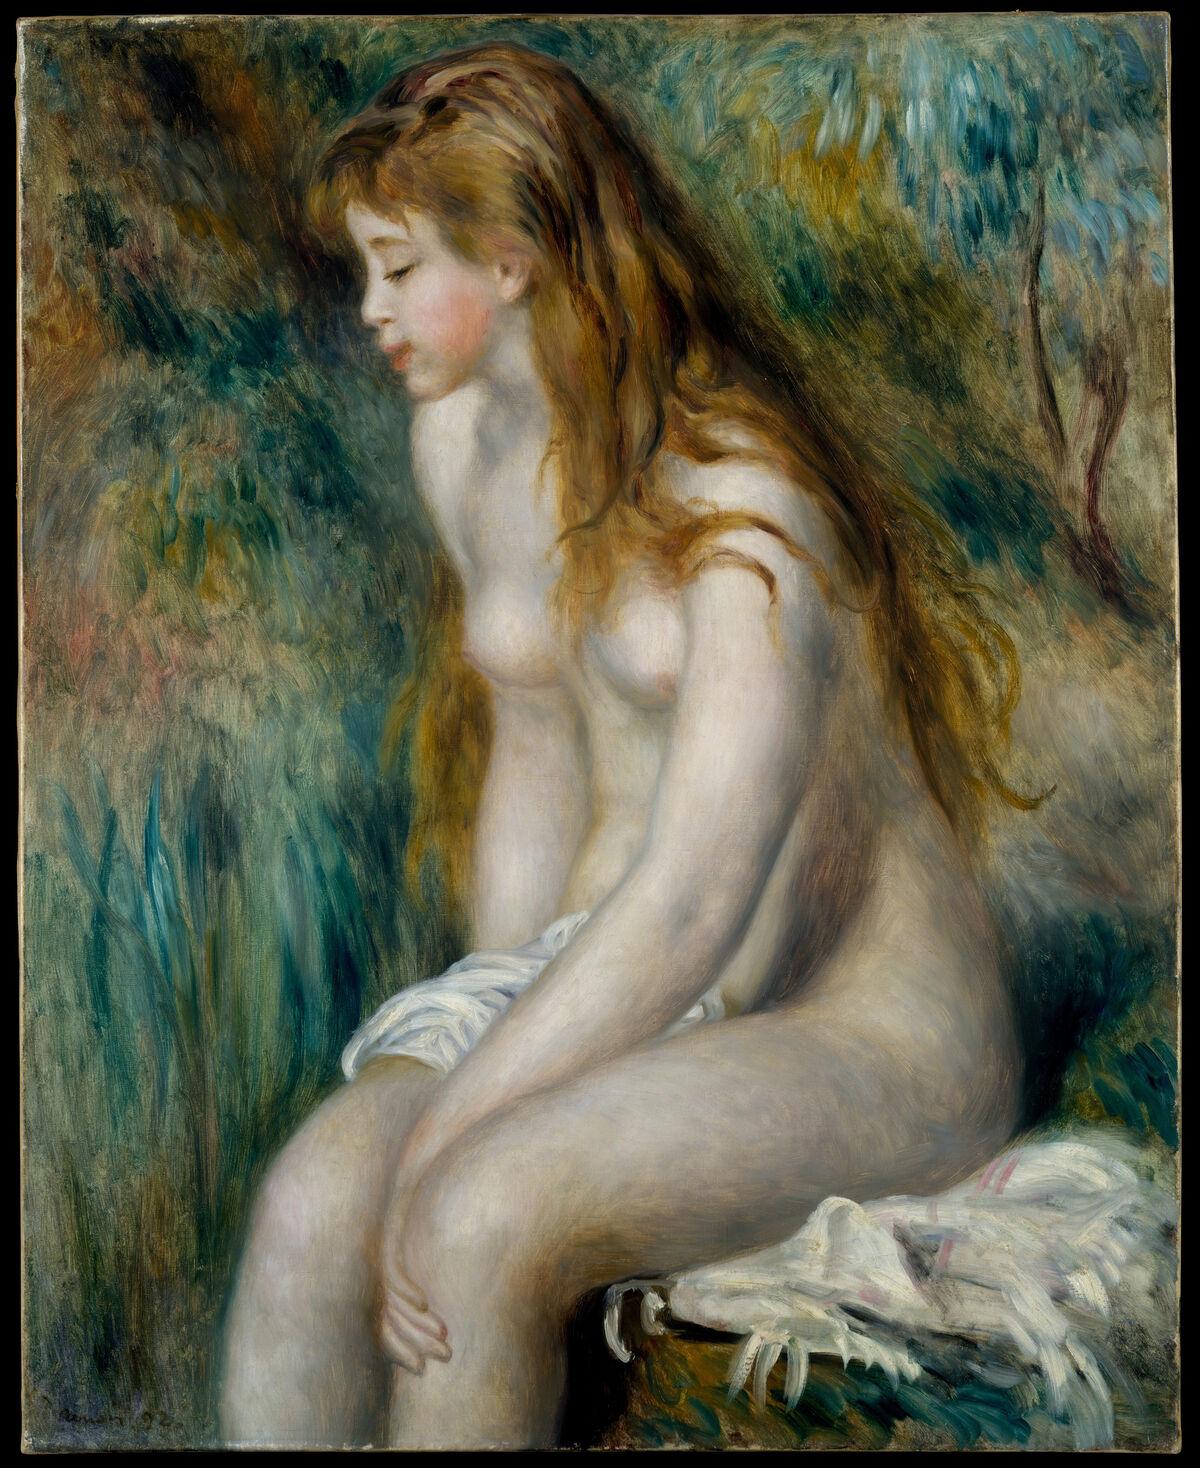 Pierre-Auguste Renoir, Young Girl Bathing, 1892. New York, The Metropolitan Museum of Art, Robert Lehman Collection, 1975 (1975.1.199). © New York, The Metropolitan Museum of Art. Courtesy of Musée Marmottan Monet.